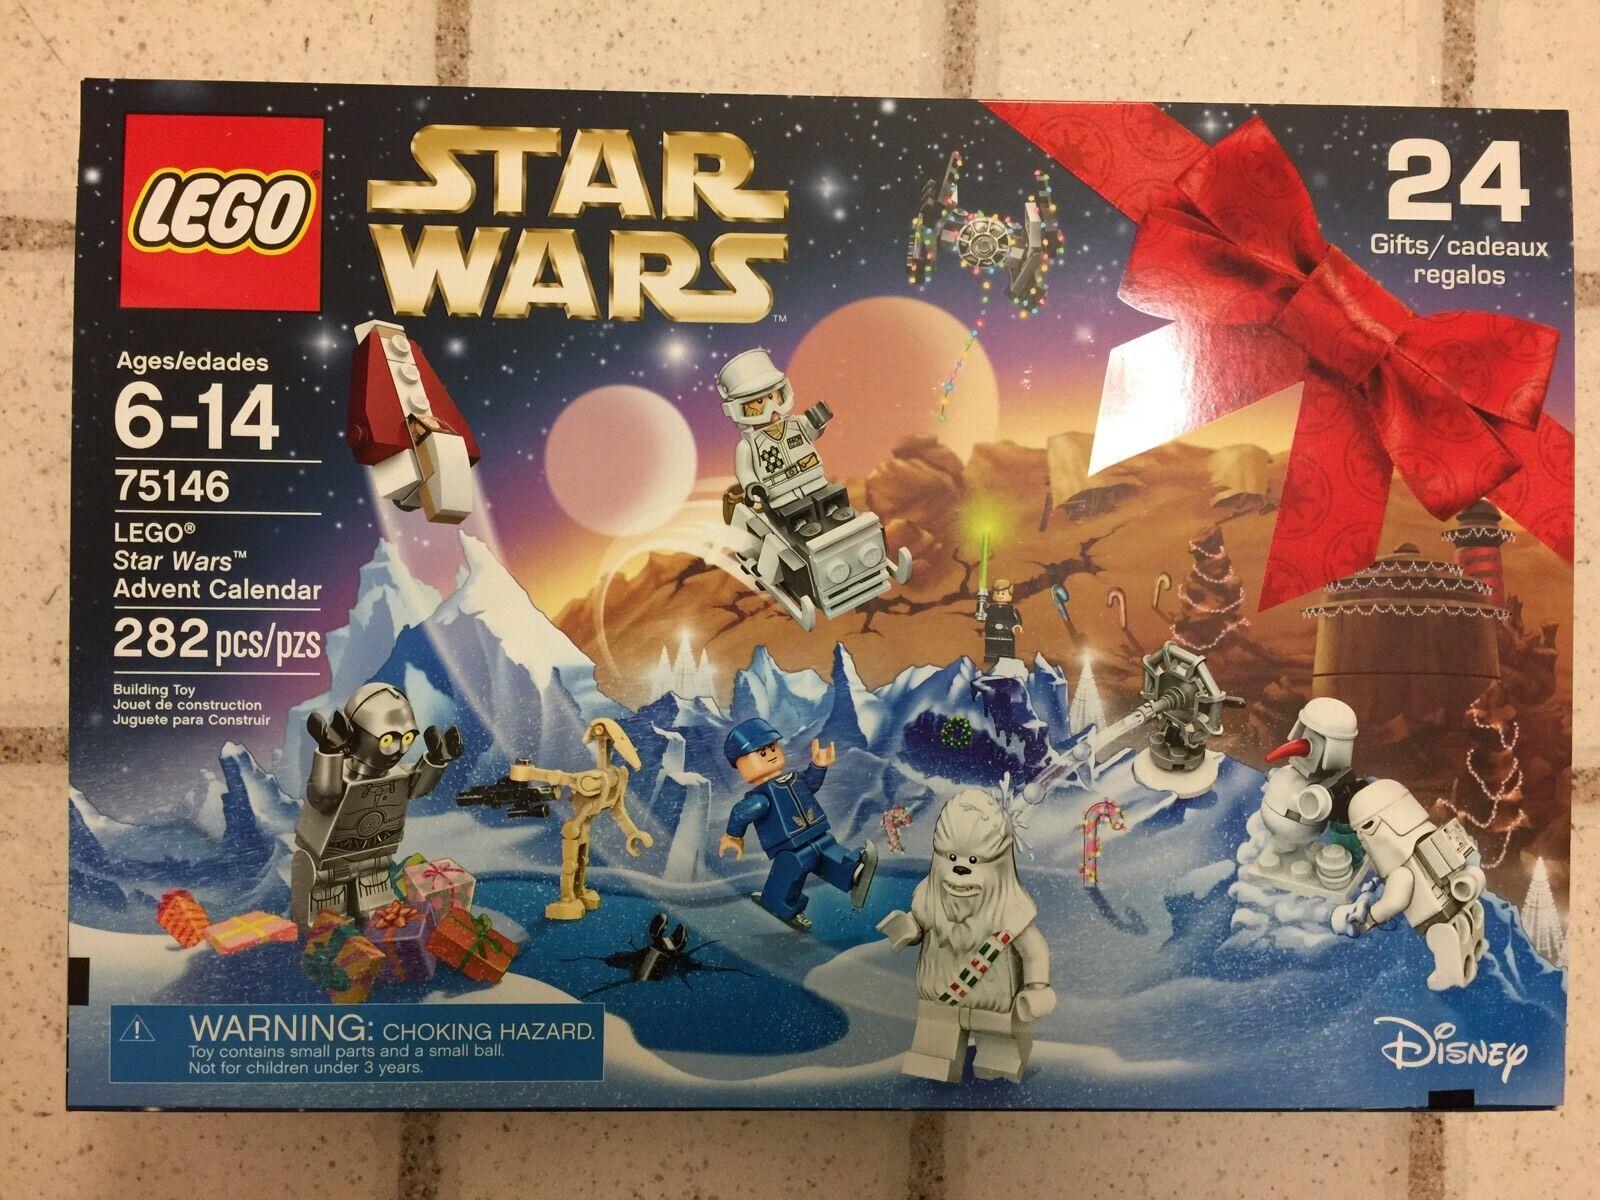 NEW 2016 LEGO Star Wars 75146 Advent Calendar Building Kit Kit Kit (282 Piece) 41f6d9